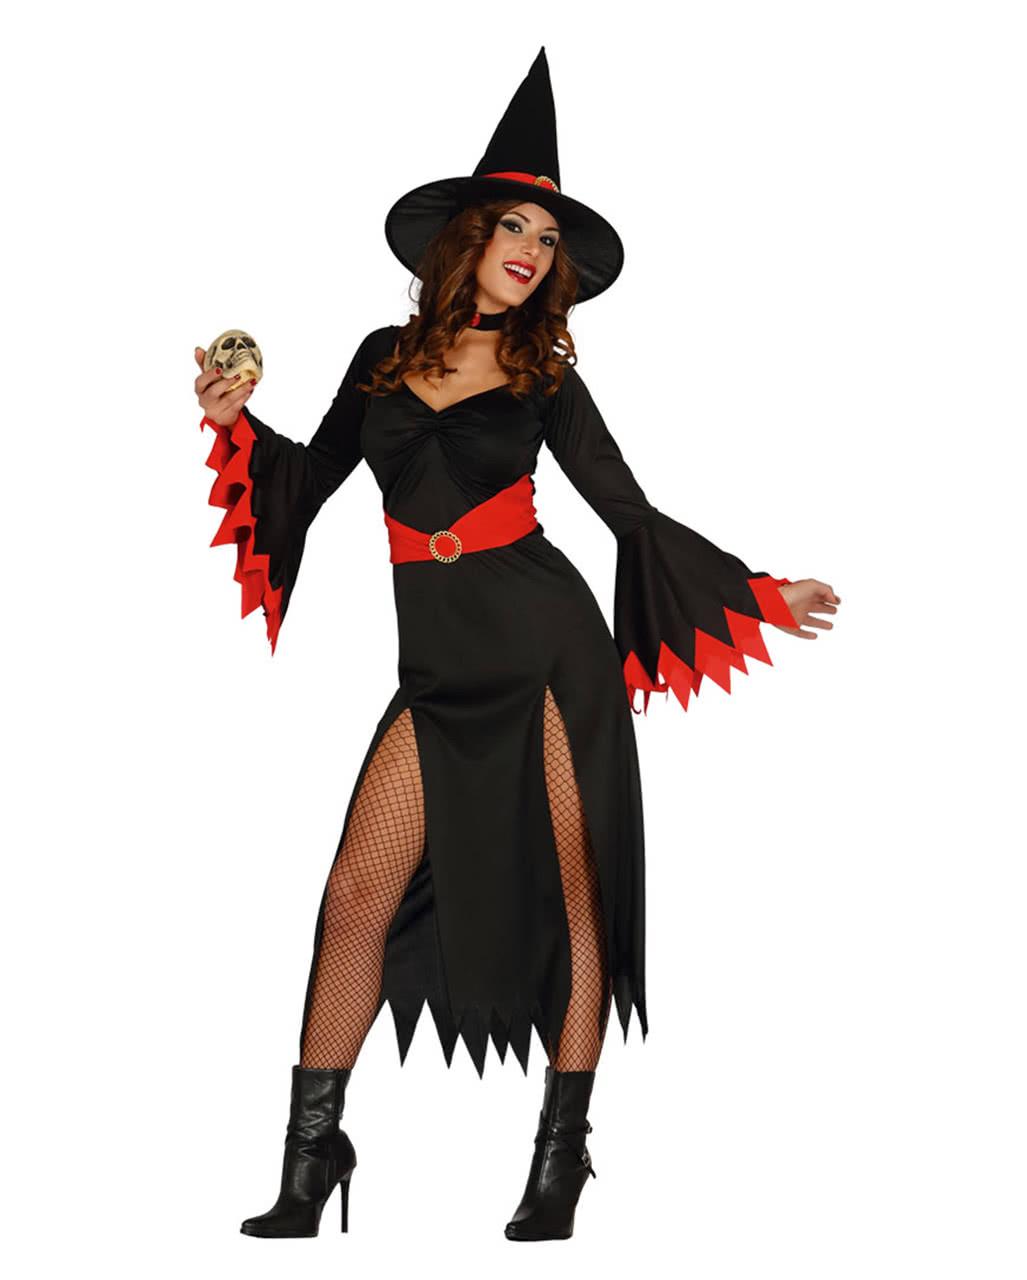 Sexy Witch Witch Costume Black/red  sc 1 st  Horror-Shop & Sexy Witch Witch Costume Black/red for Halloween u0026 Walpurgis Night ...